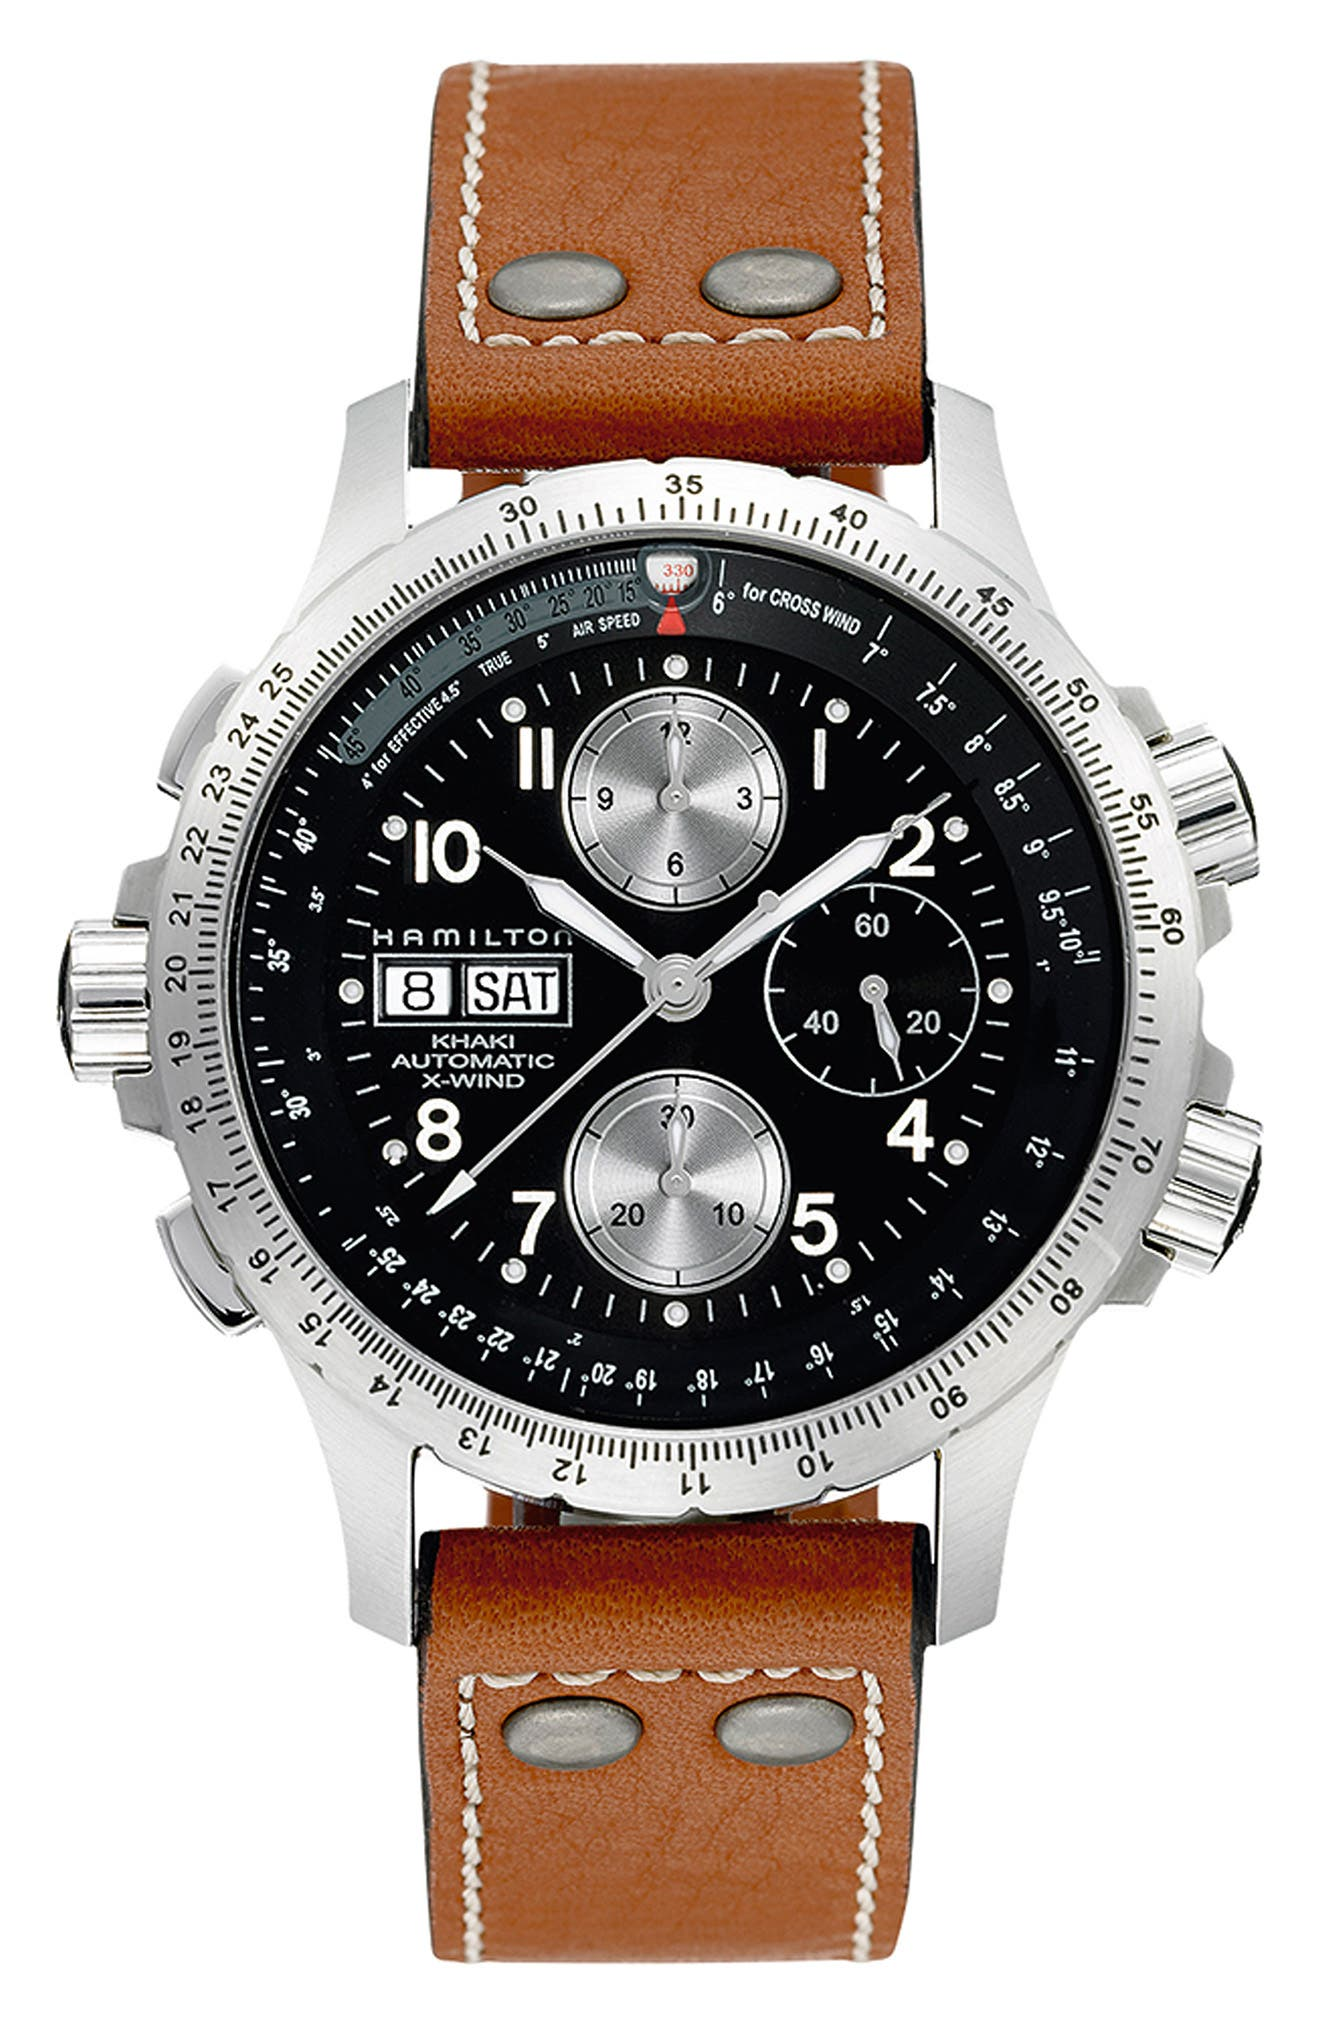 HAMILTON Khaki Aviation X-Wind Automatic Chronograph Leather Strap Watch, 44mm, Main, color, BROWN/ BLACK/ SILVER